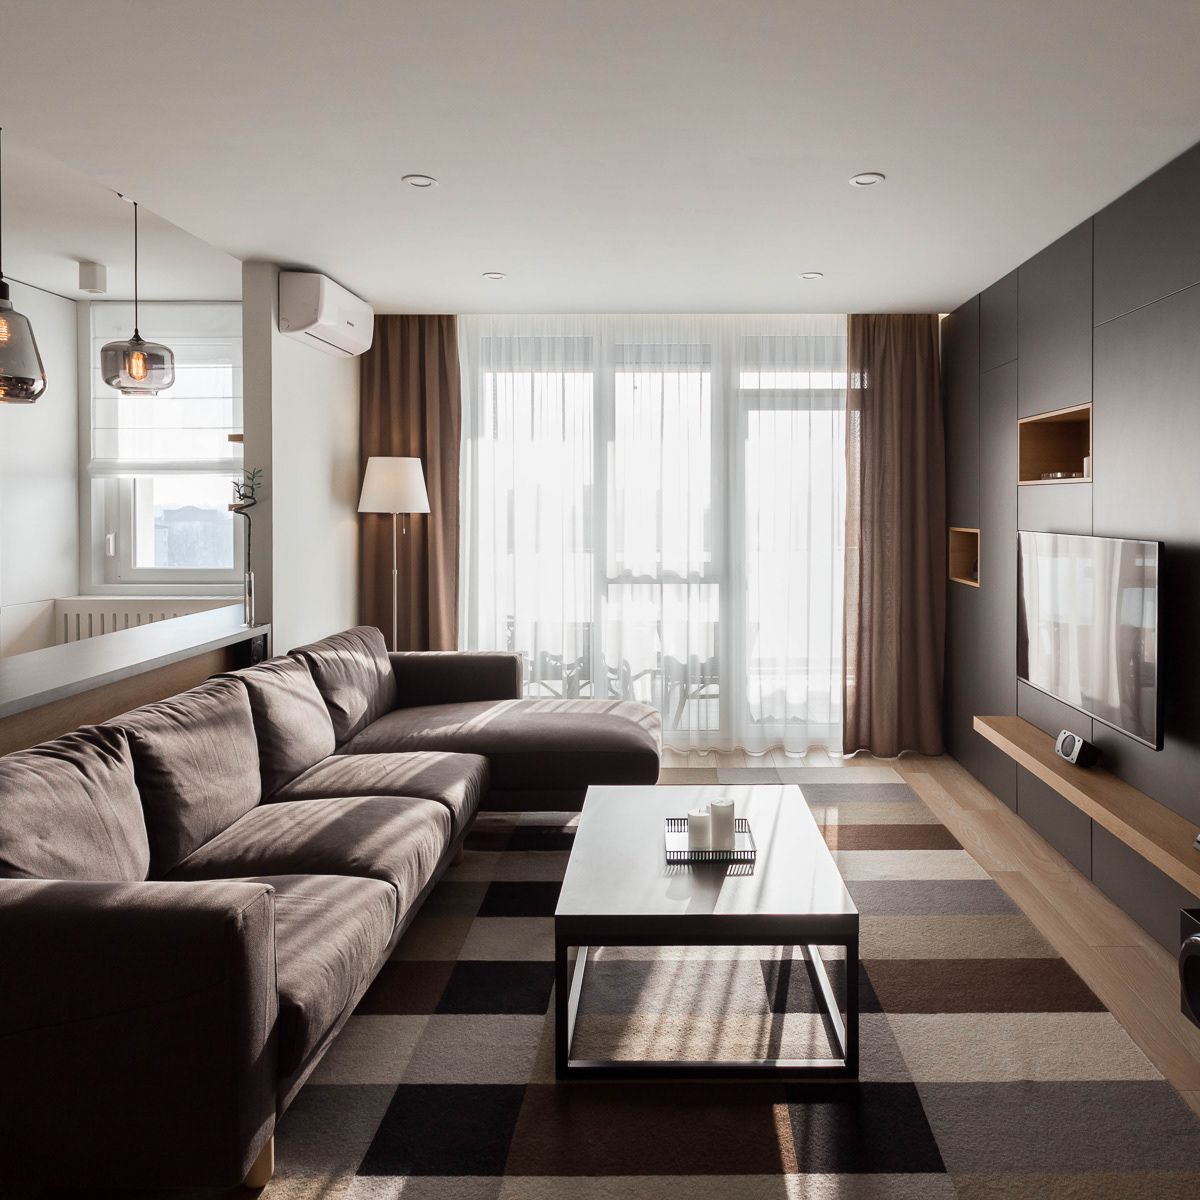 Davidsign - Design Studio - Dark & Cozy 2-Room Apartment